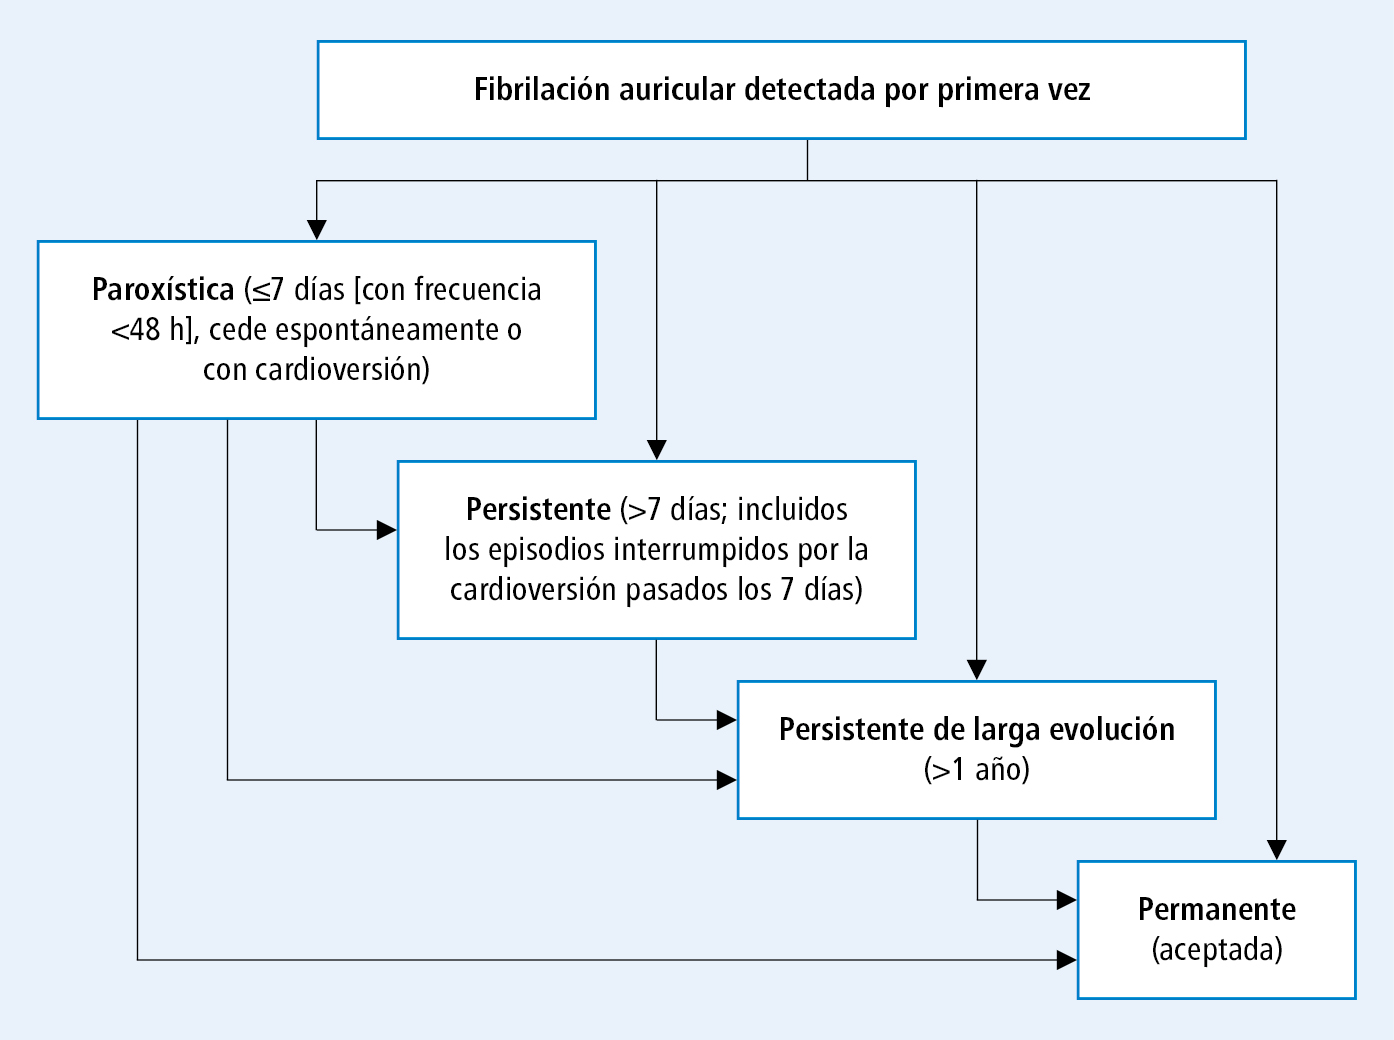 diabetes valvular fibrilación auricular emedicina